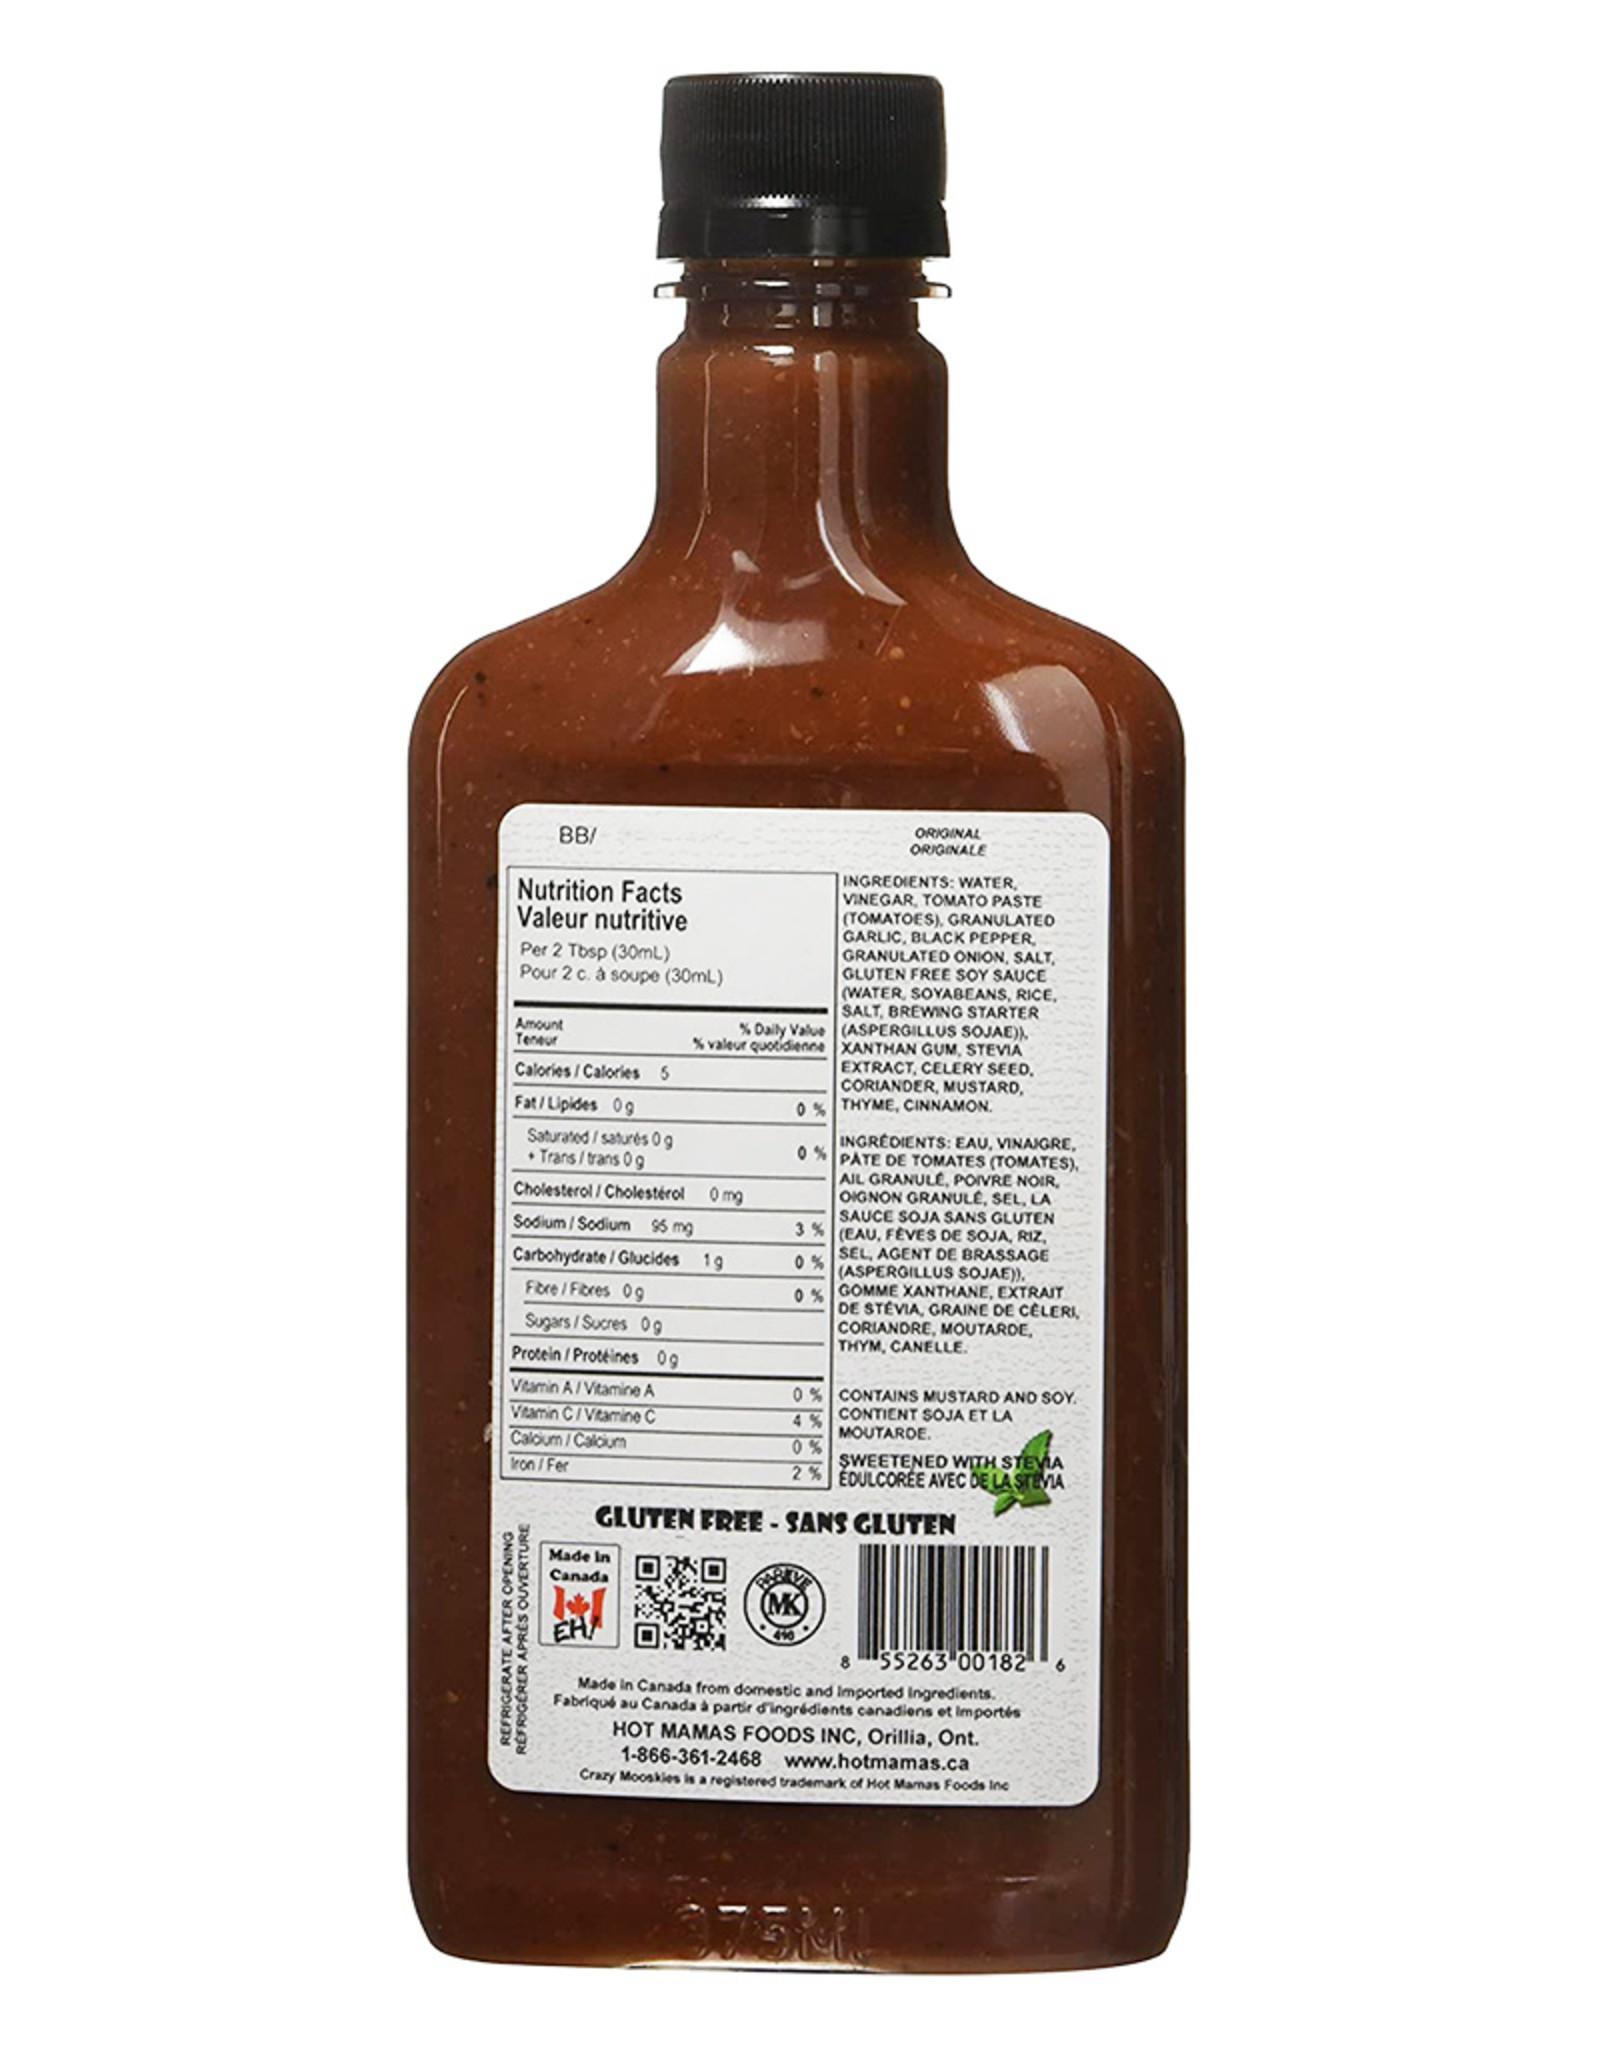 Crazy Mooskies Crazy Mooskies - No Sugar Added BBQ Sauce, Original (375ml)